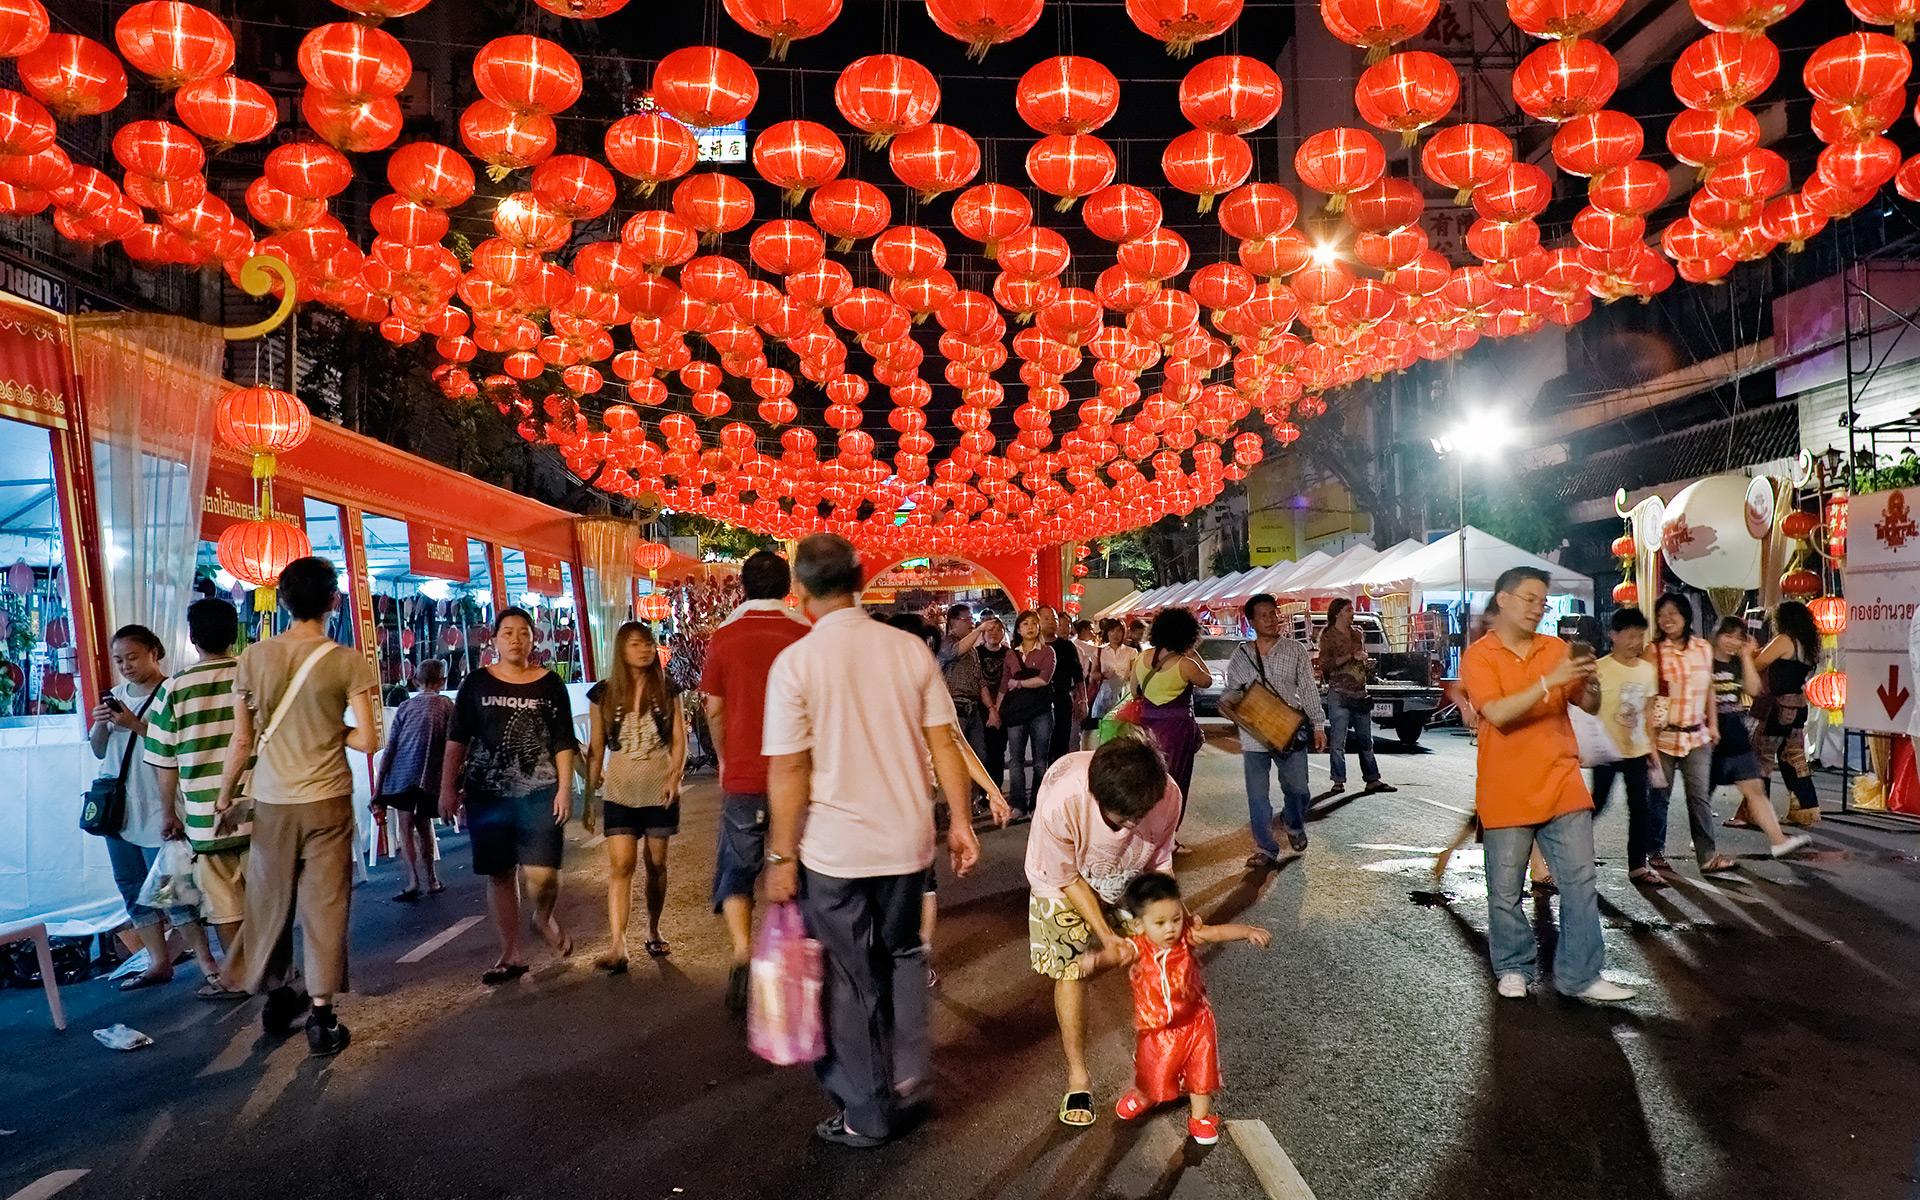 #thailand #thailandtourism #TAT #topthingstodoinbangkok #bangkokchinatown